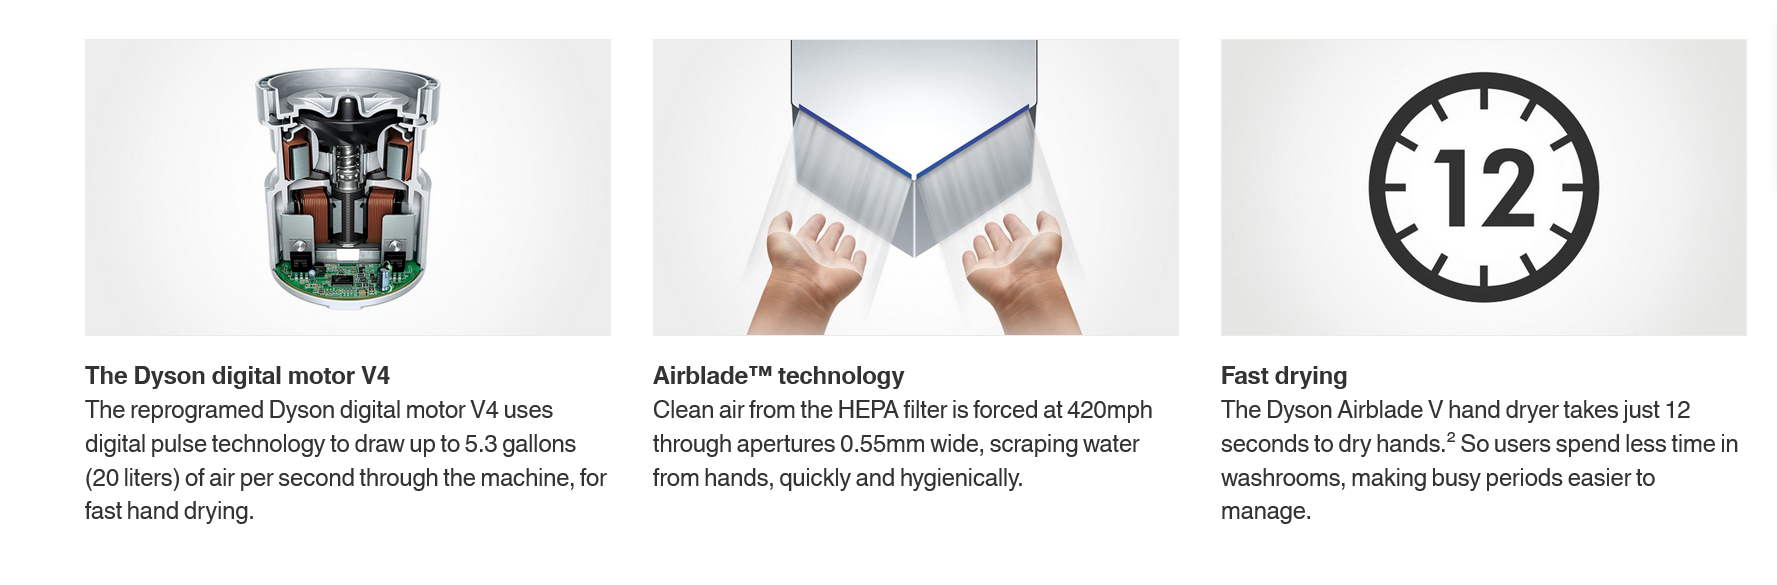 dyson airblade v installation guide